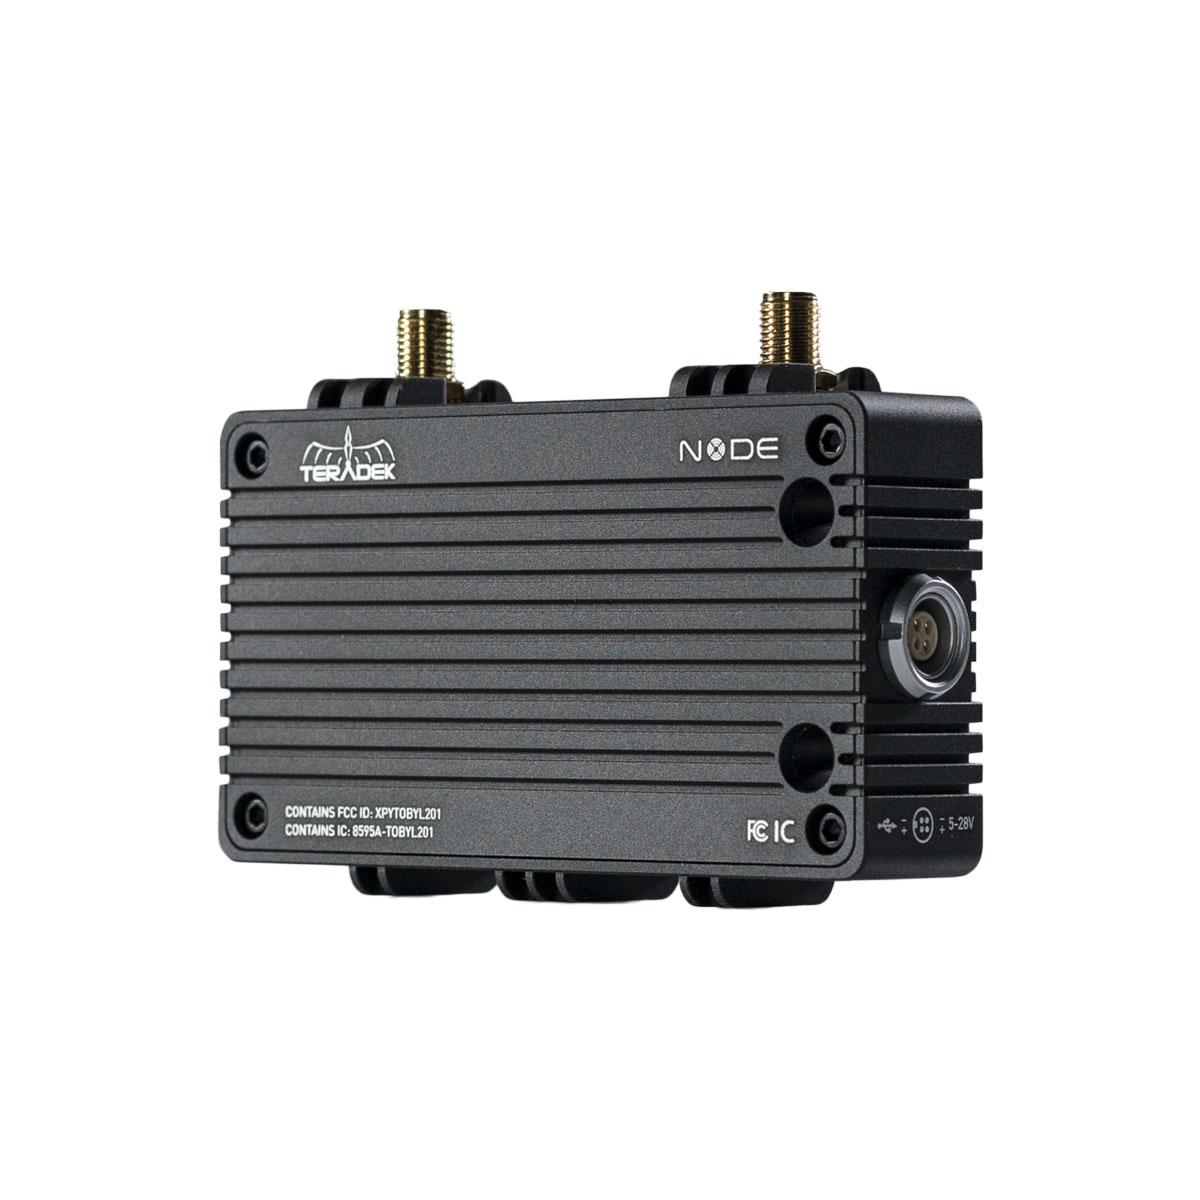 Node - 3G/4G/LTE Modem- 4-pin to USB / Japan